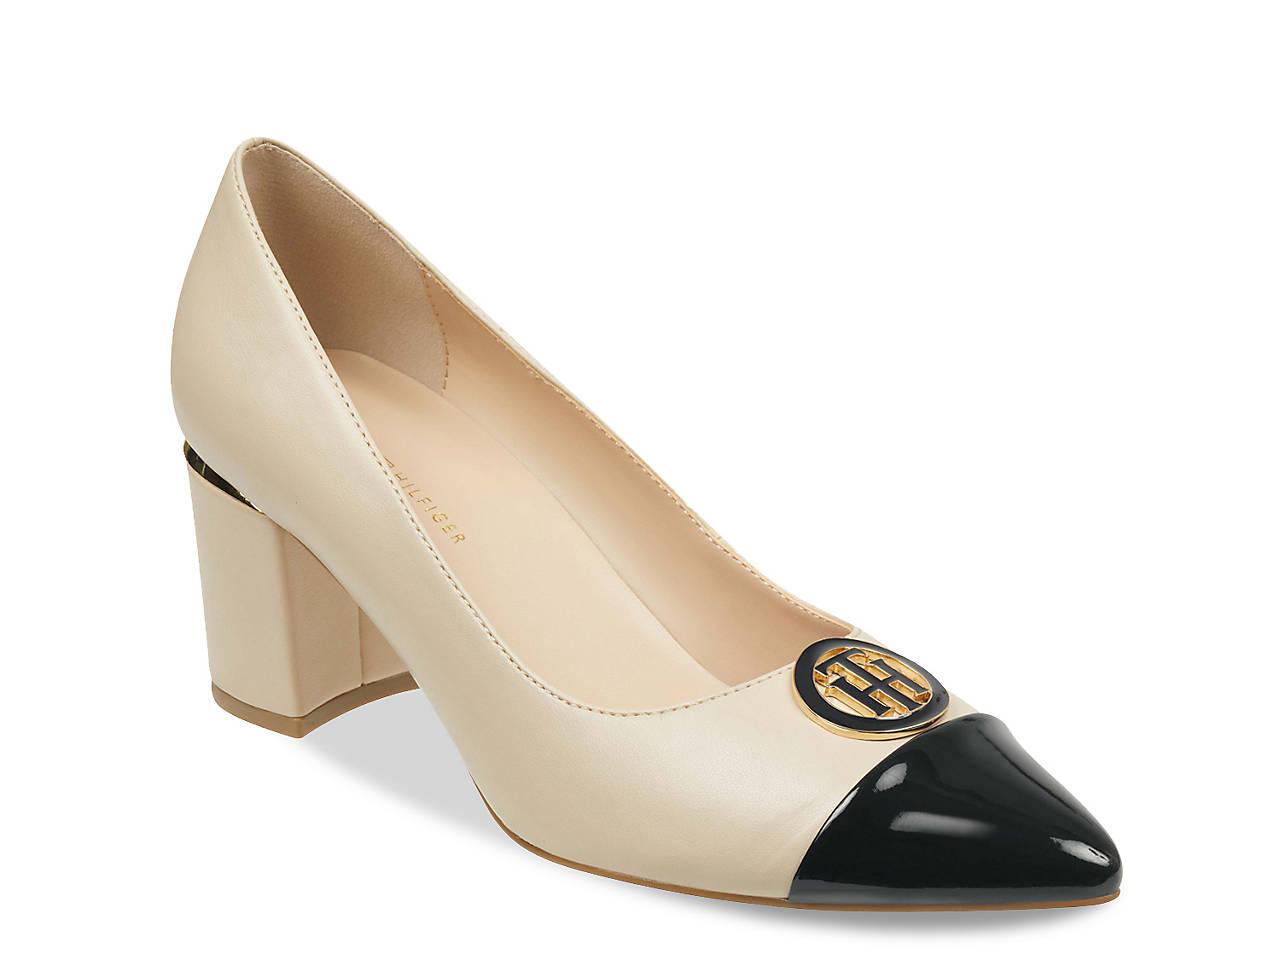 904bb16b7 Tommy Hilfiger Neysa 2 Pump Women s Shoes